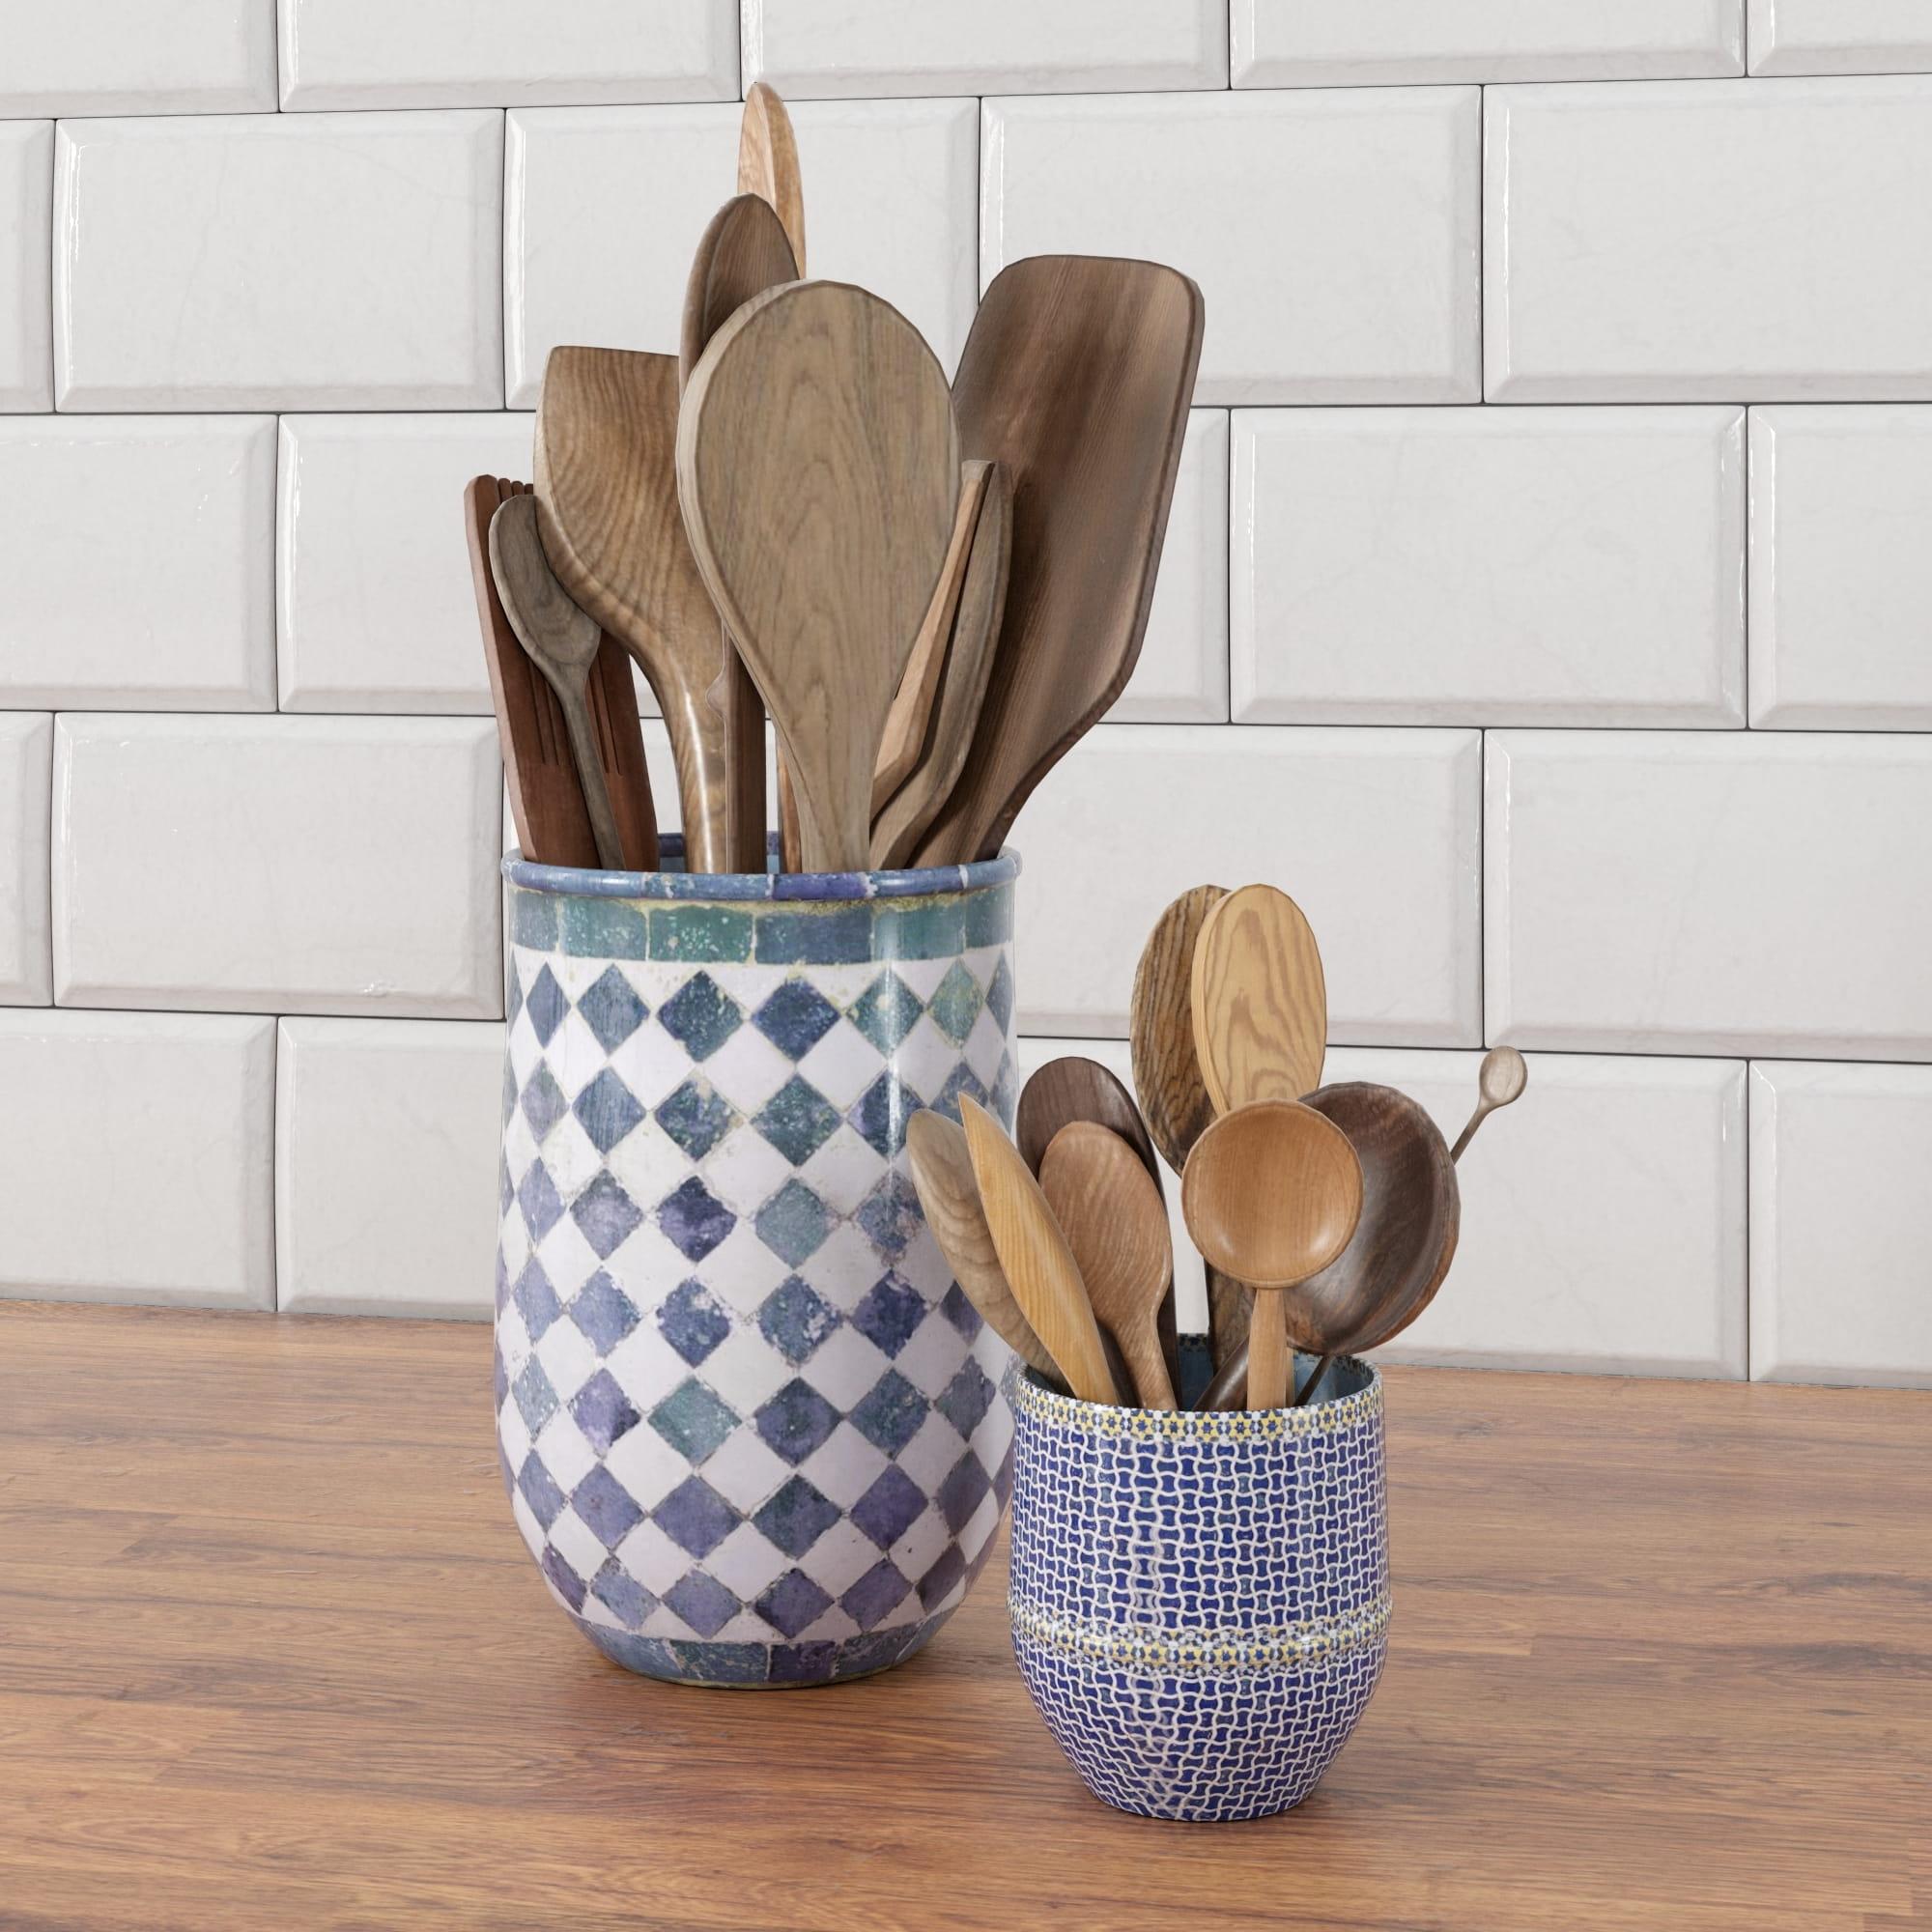 kitchen props 11 AM231 Archmodels